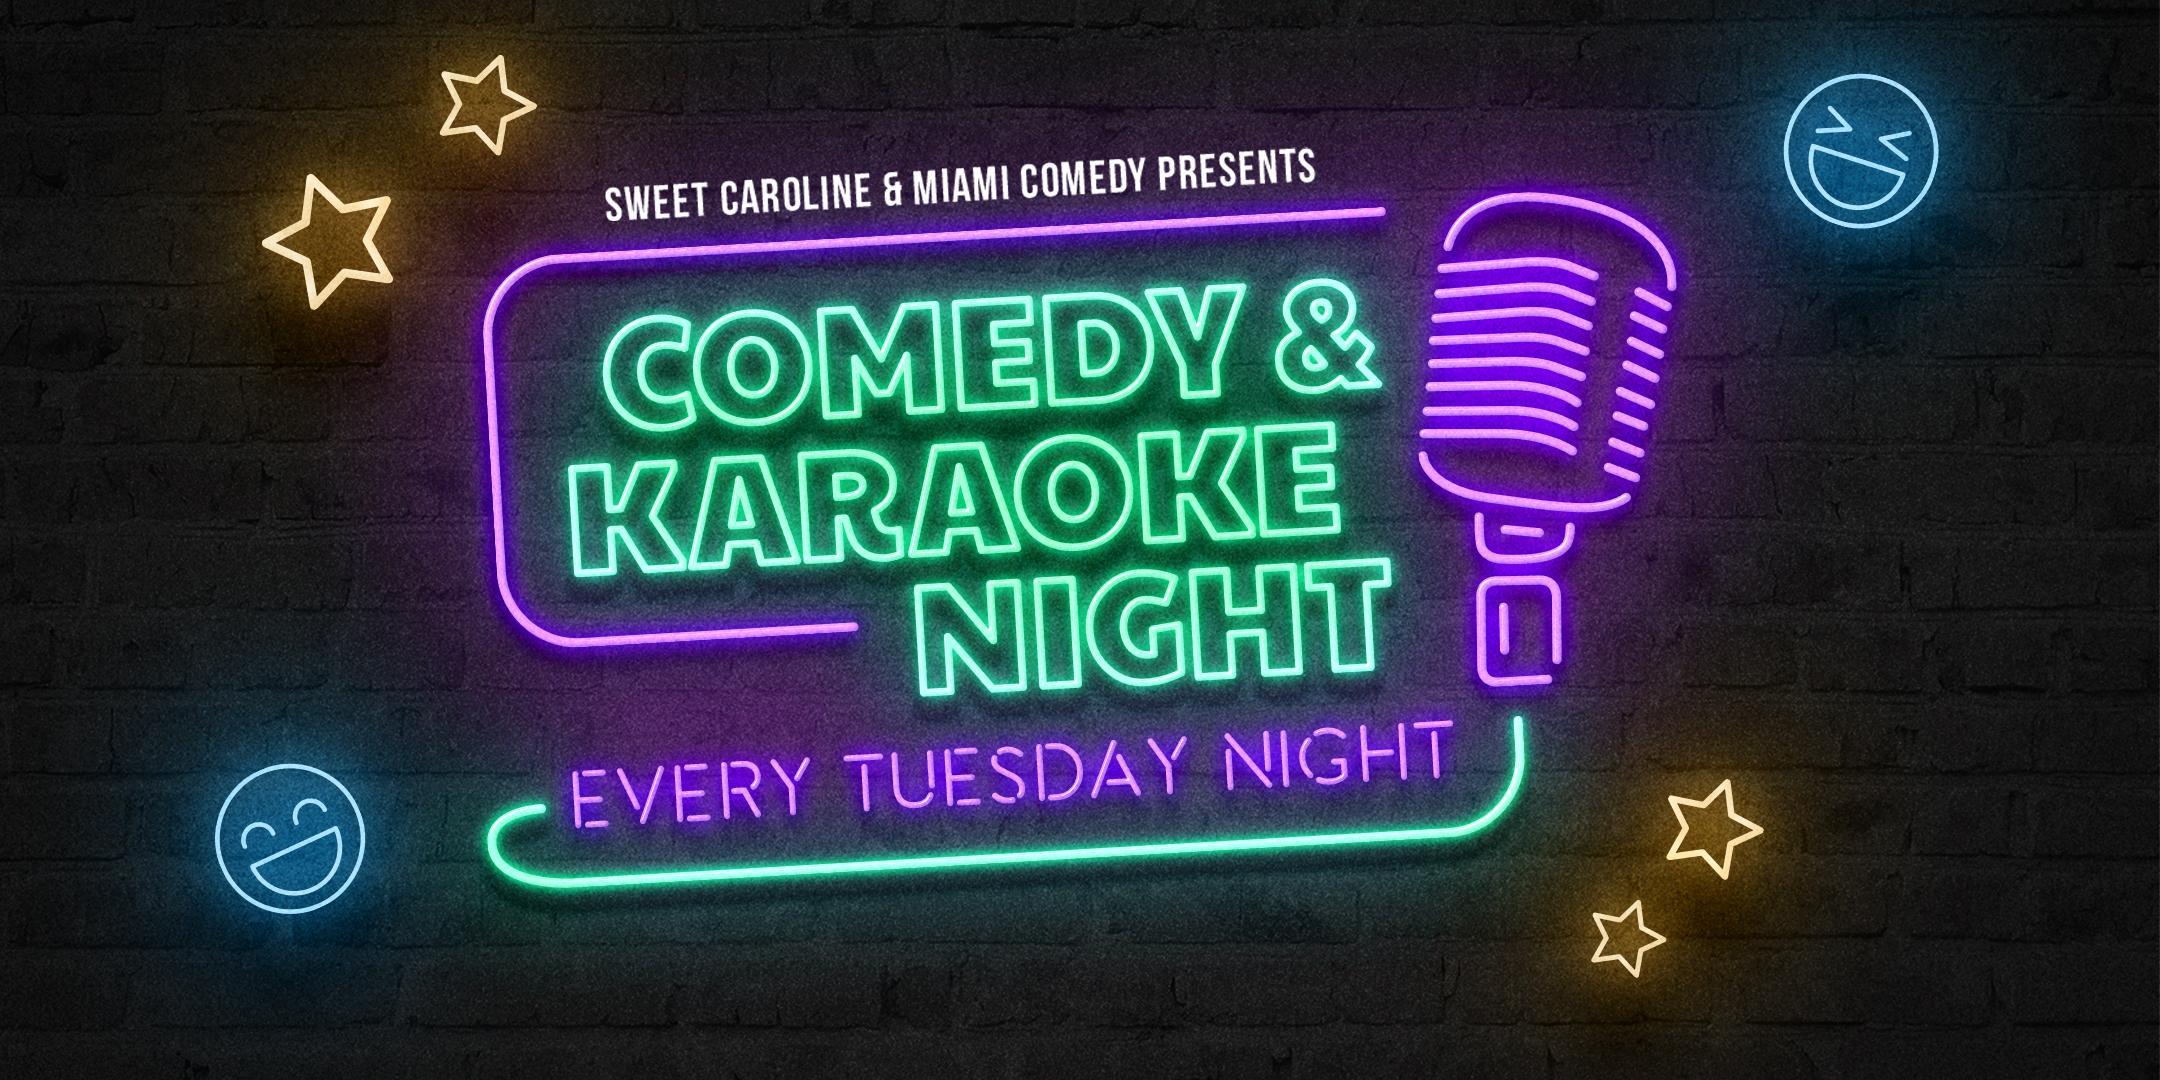 Comedy & Karaoke Night at Sweet Caroline!